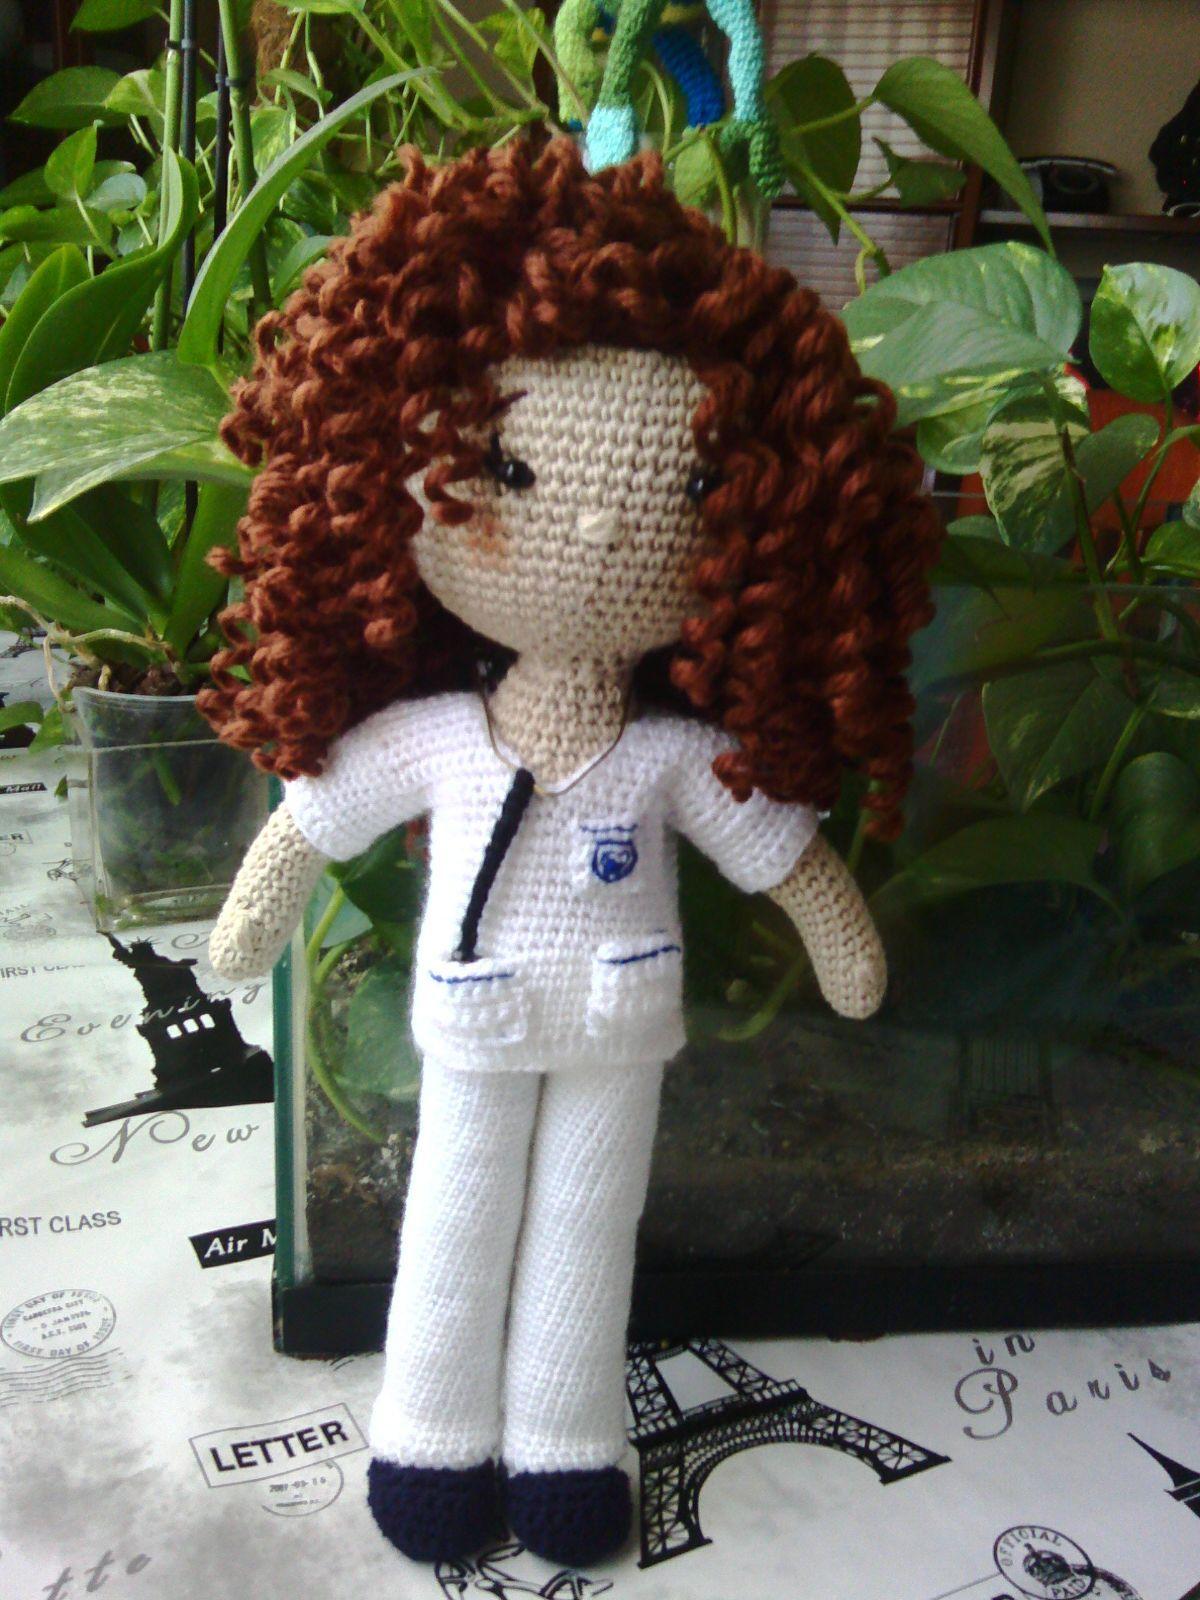 enfermera al estilo cuchiflus